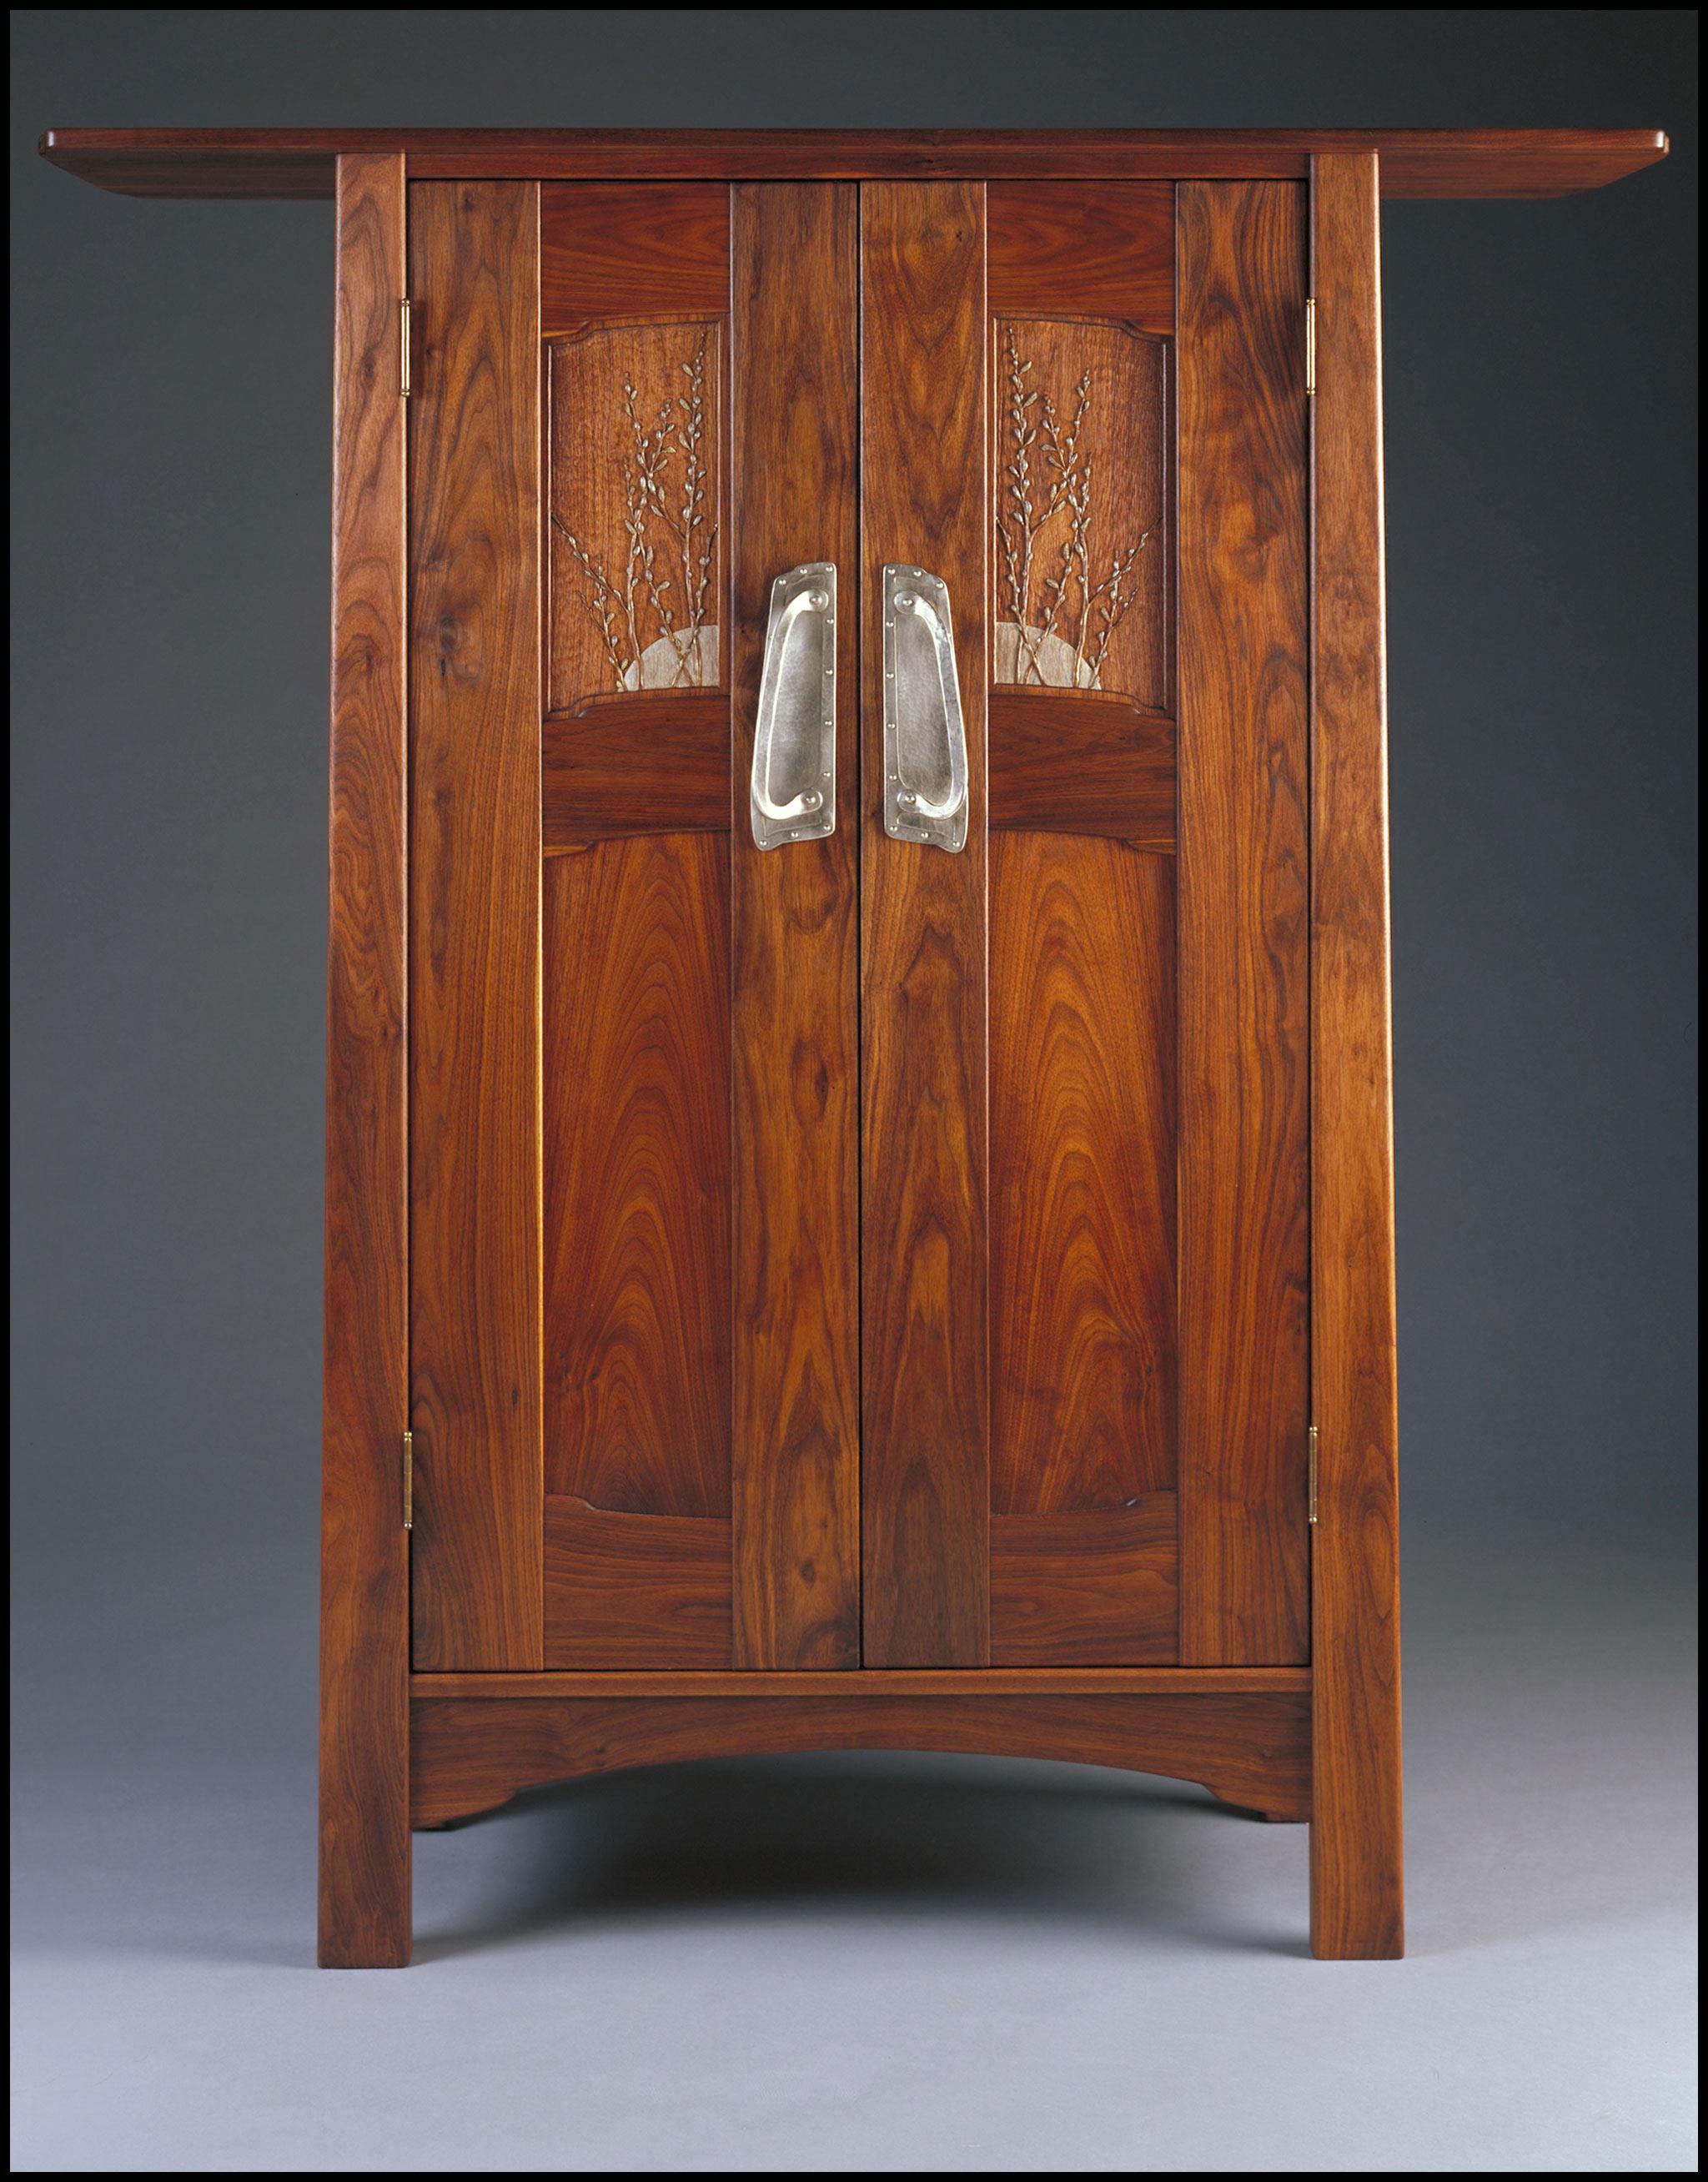 Aesthetic Cabinet